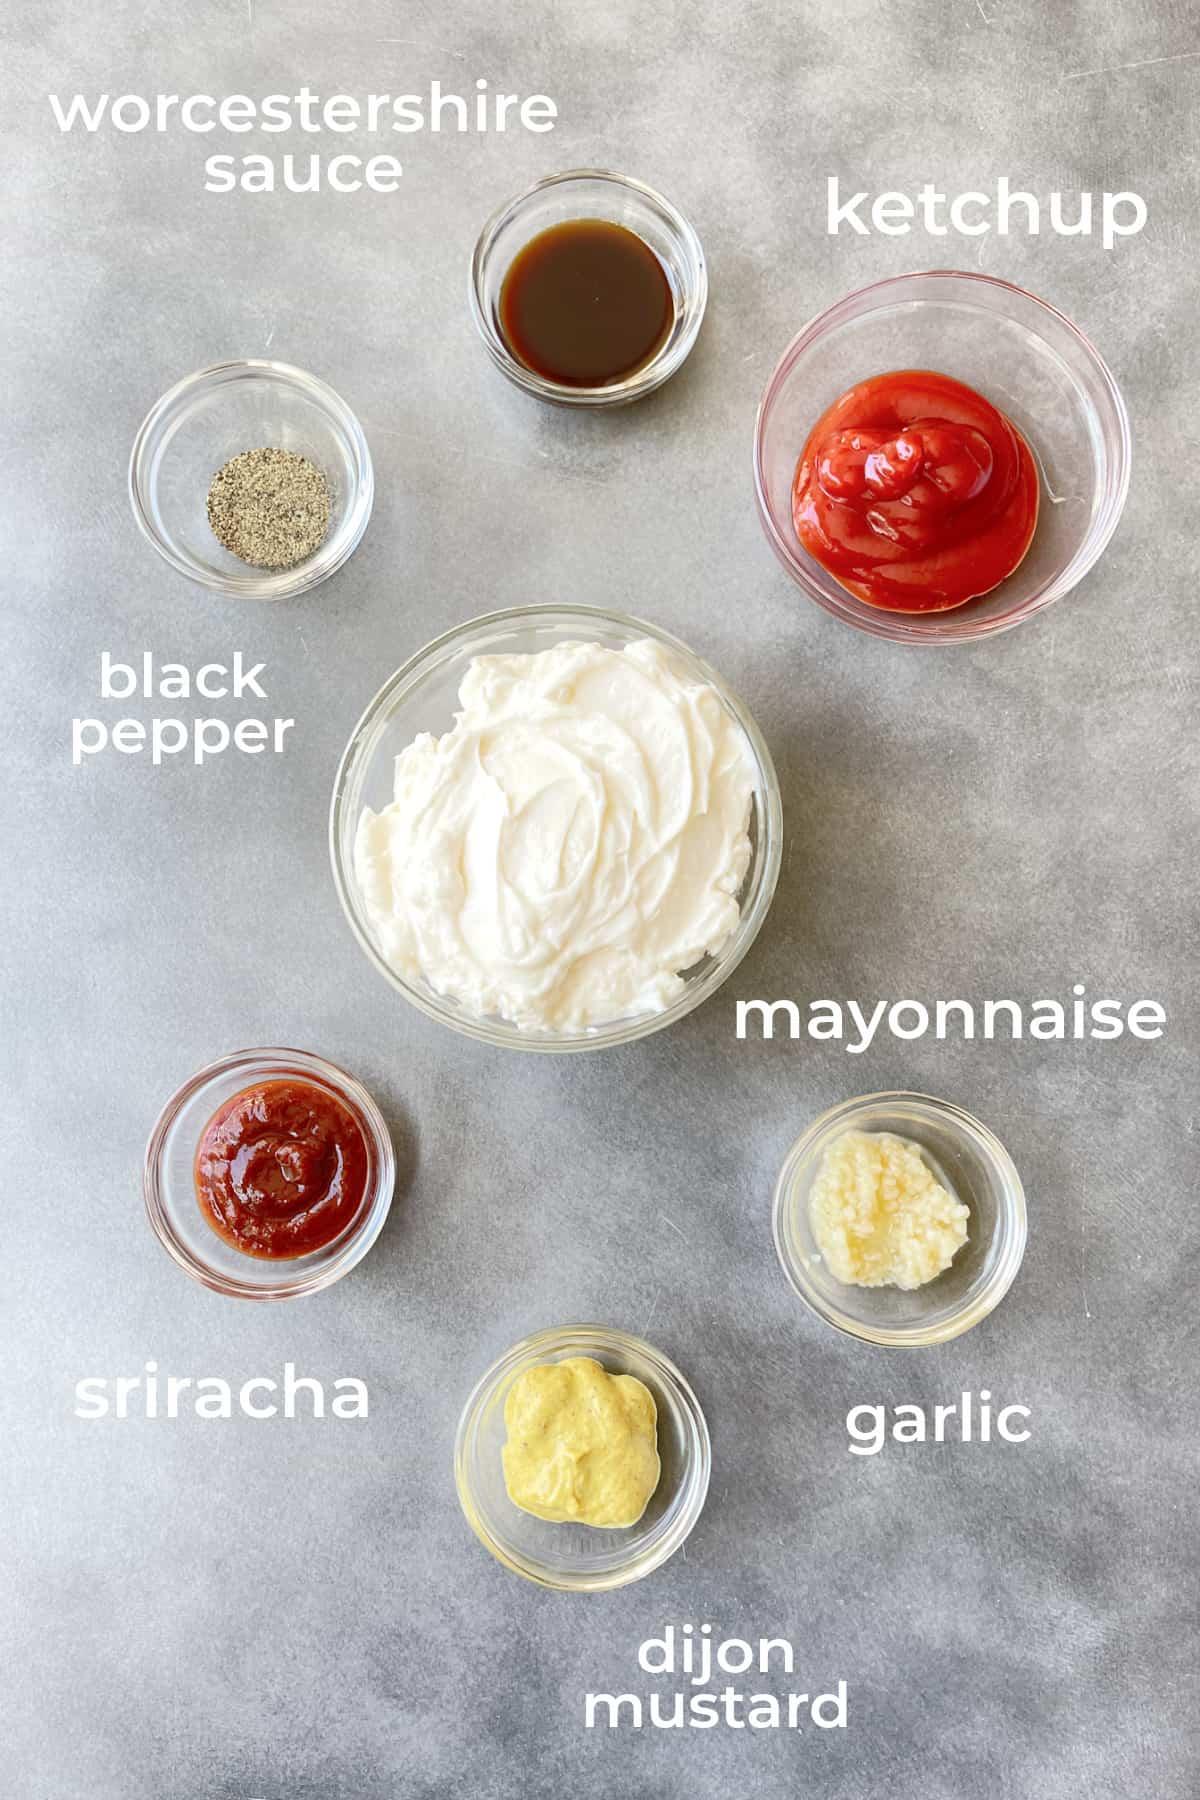 ingredients for burger sauce - mayo, ketchup, dijon, sriracha, garlic, Worcestershire sauce, pepper